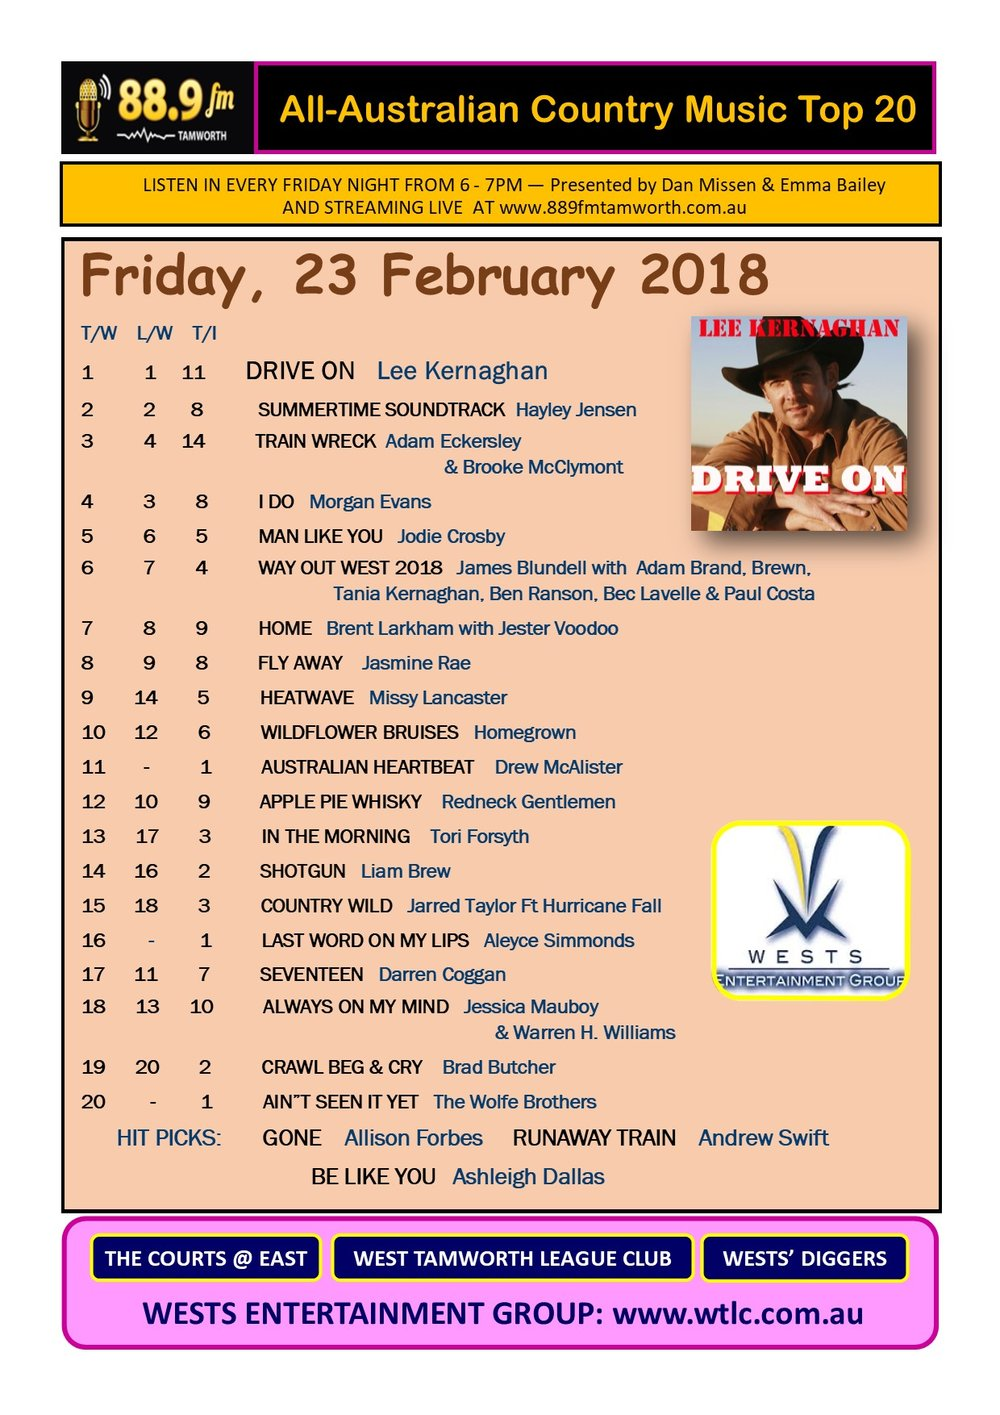 889FM CHART 23 Feb.jpg